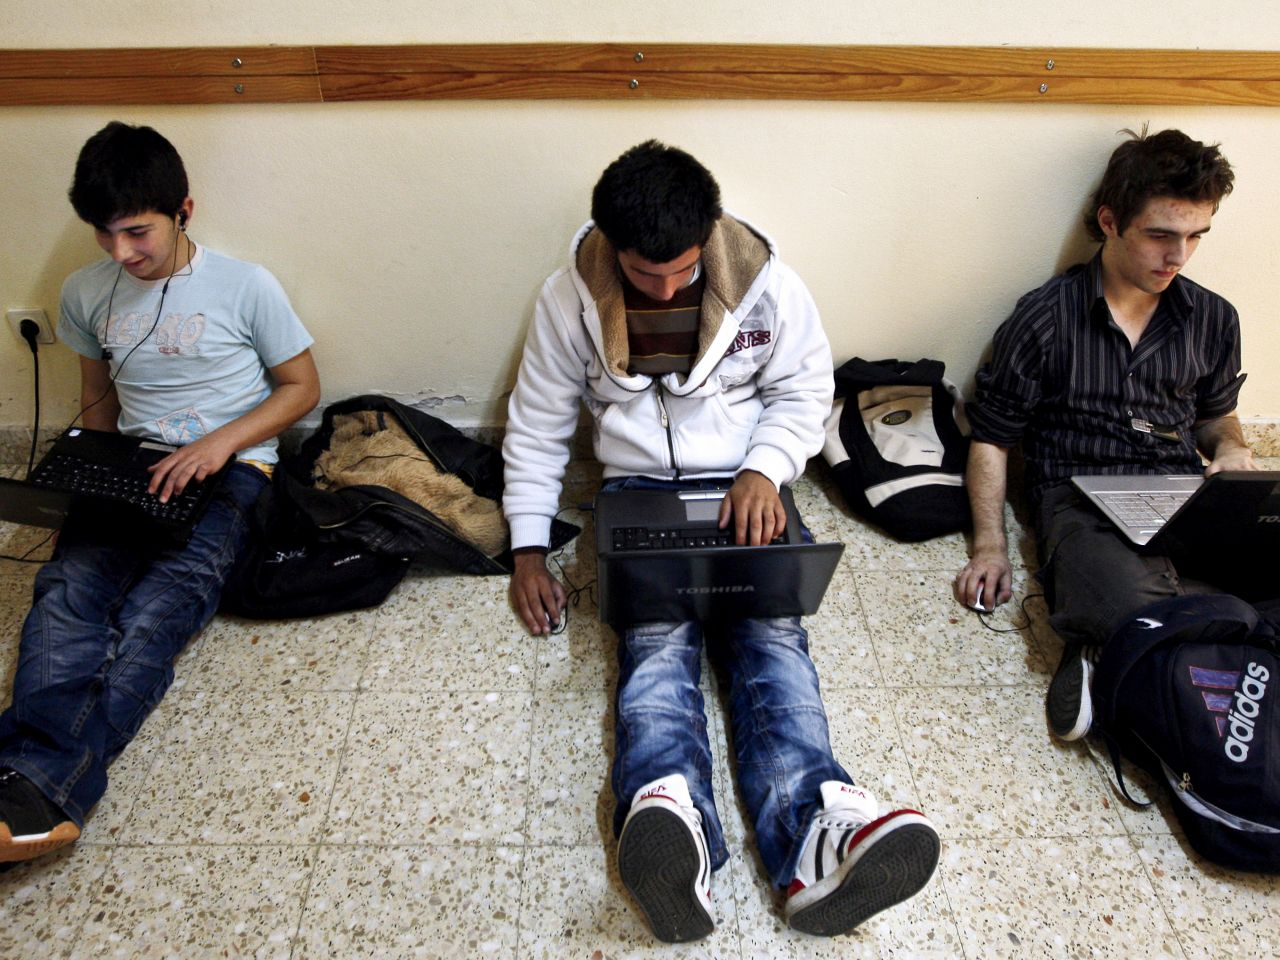 Braga with fastest mobile internet in Portugal